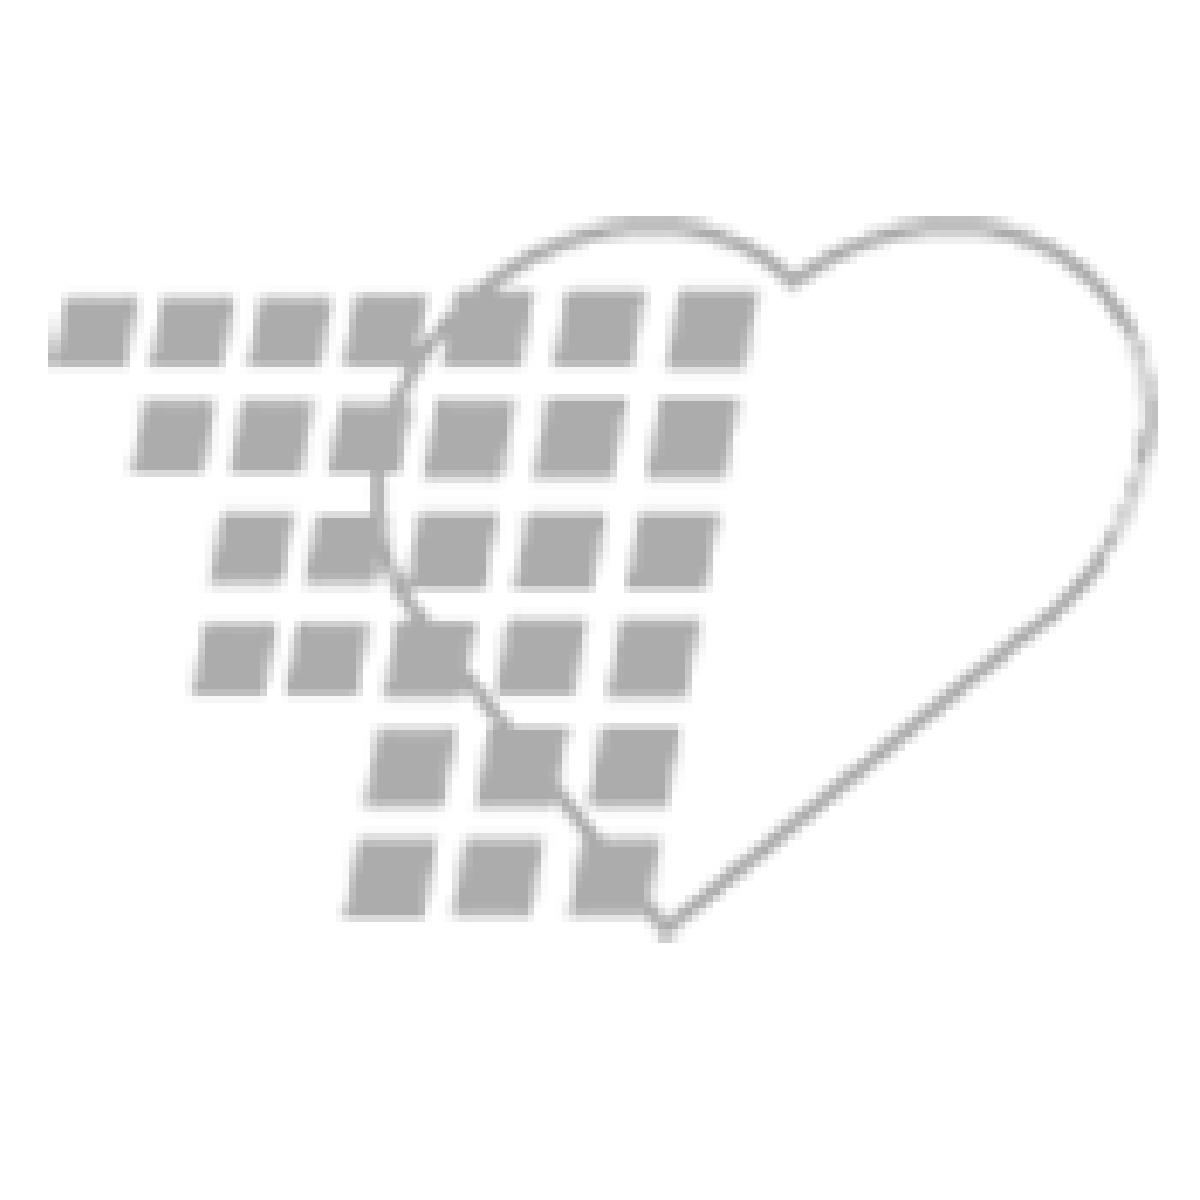 06-93-3540 - AccessRx-4 Tier